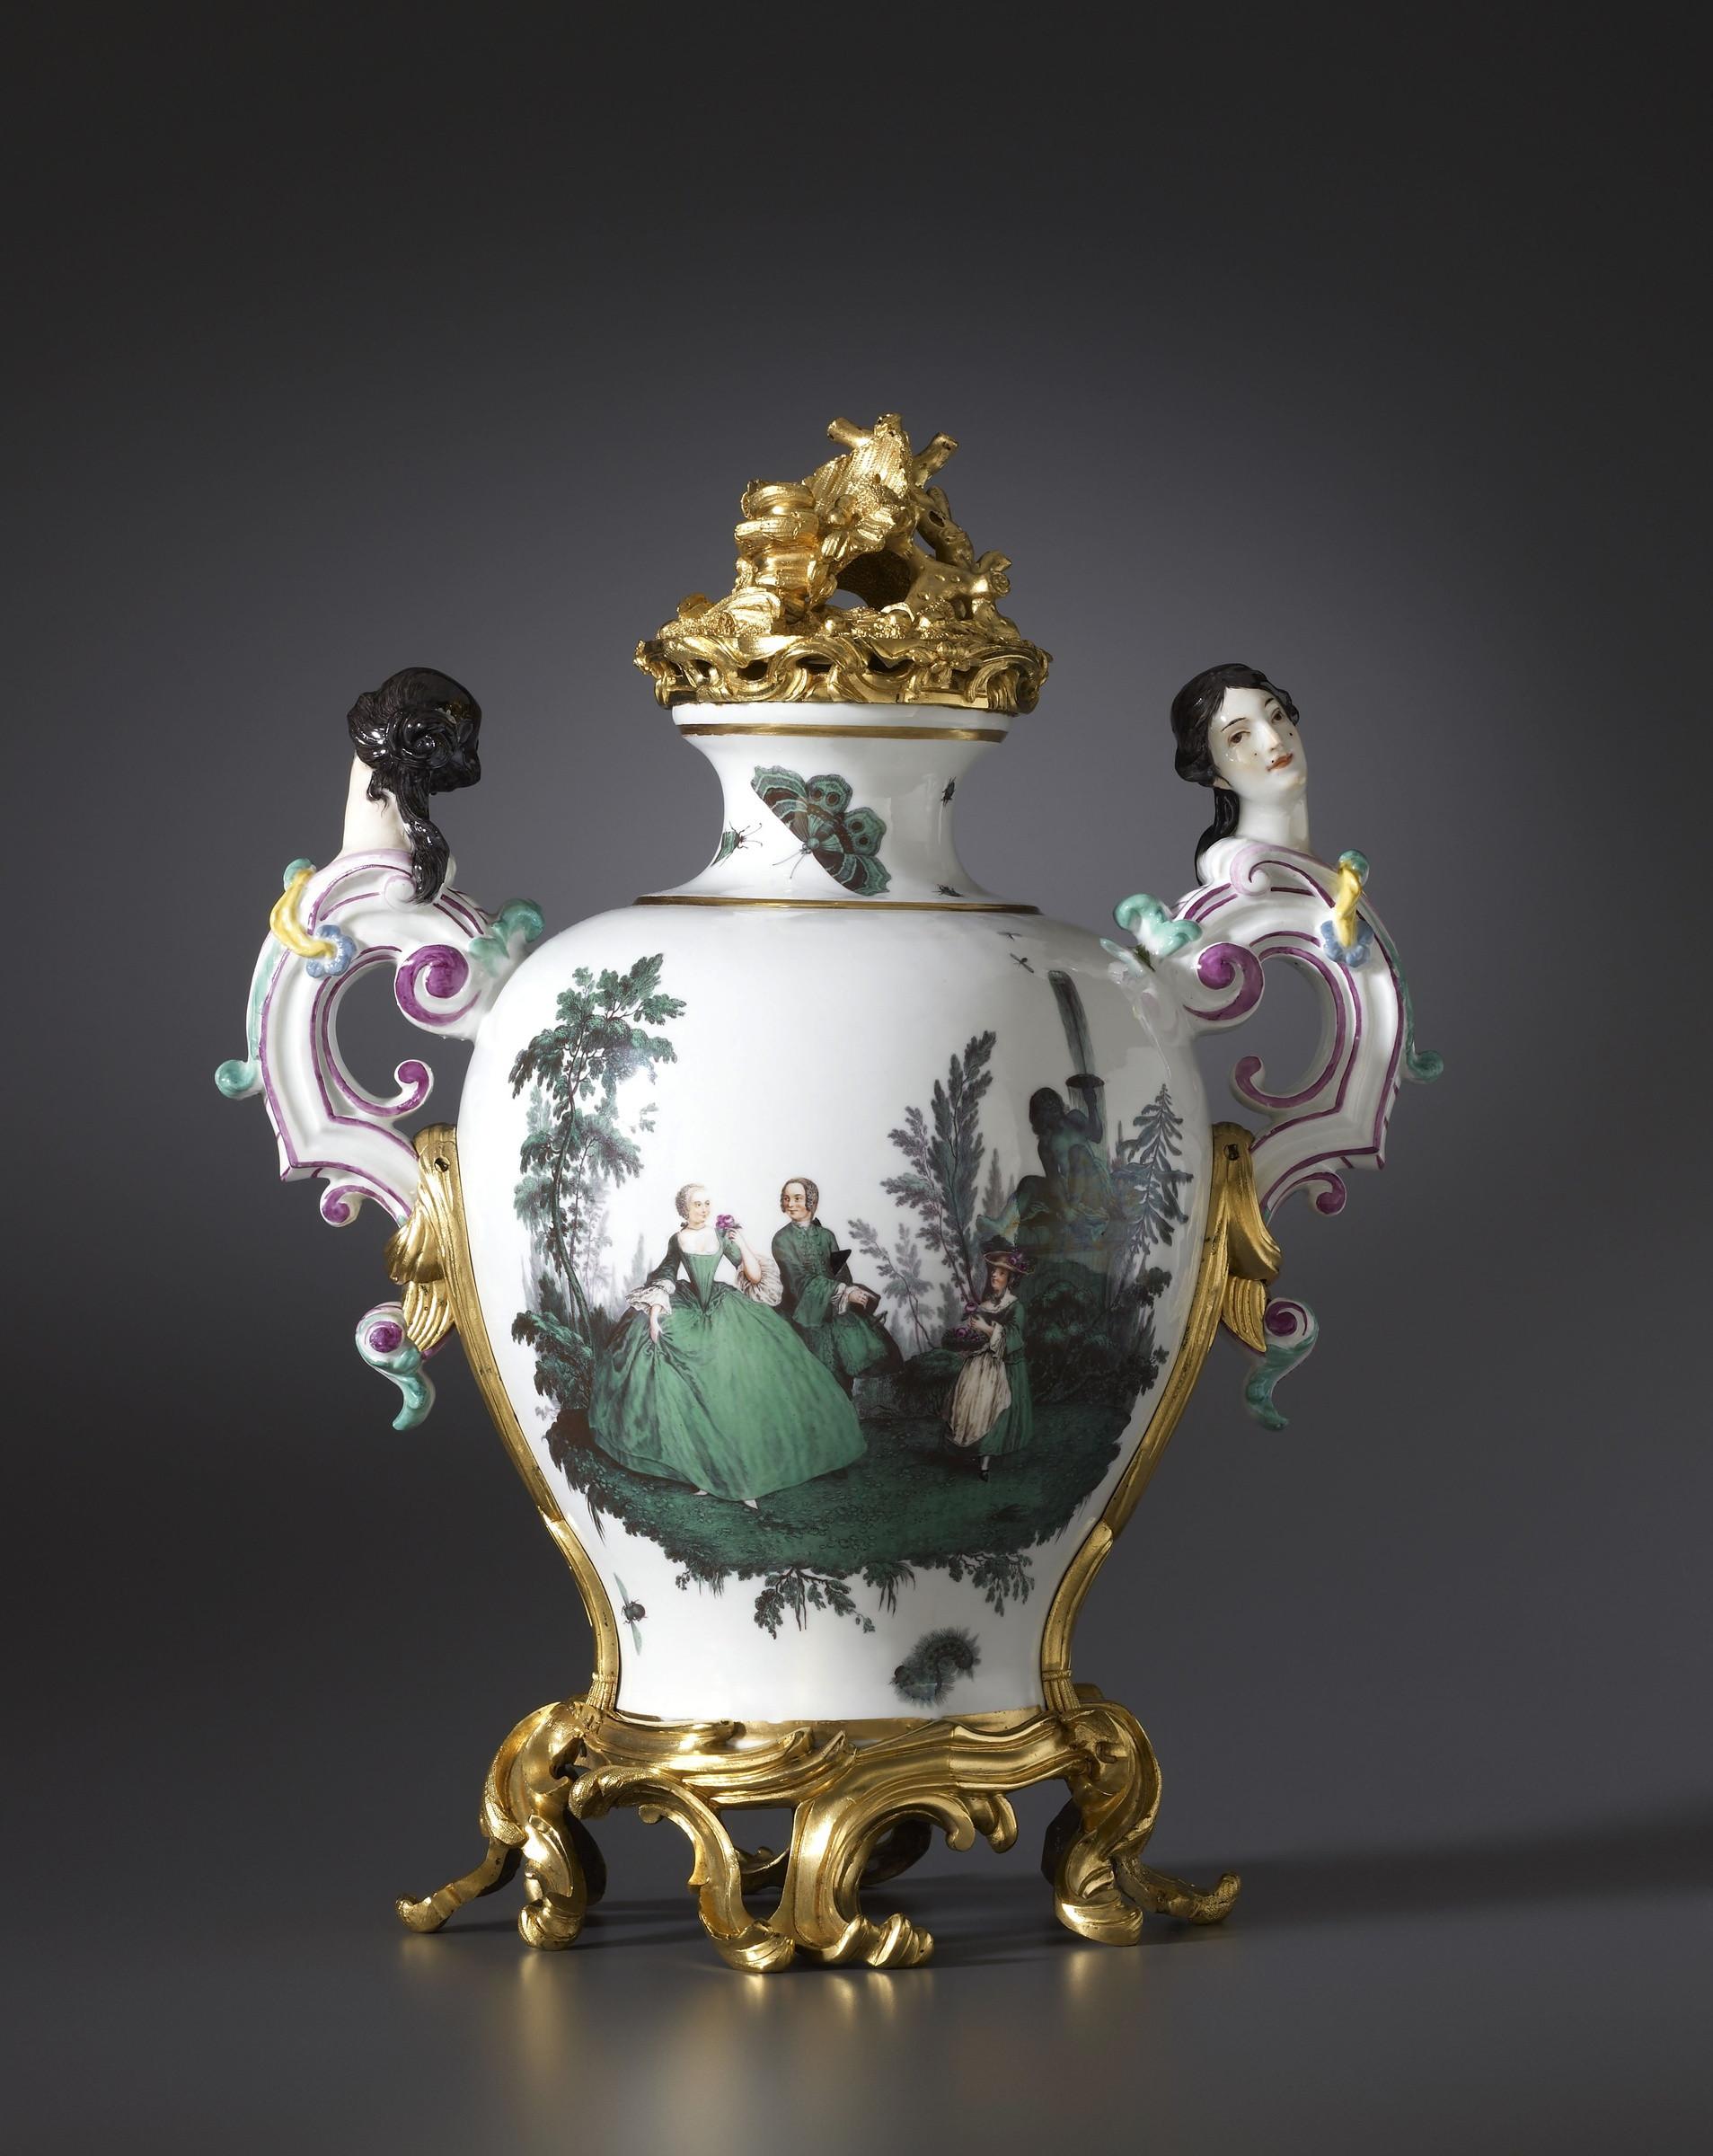 antique japanese metal vases of meissen a louis xv vase by meissen almost certainly modelled by within a louis xv vase by meissen almost certainly modelled by johann joachim ka¤ndler